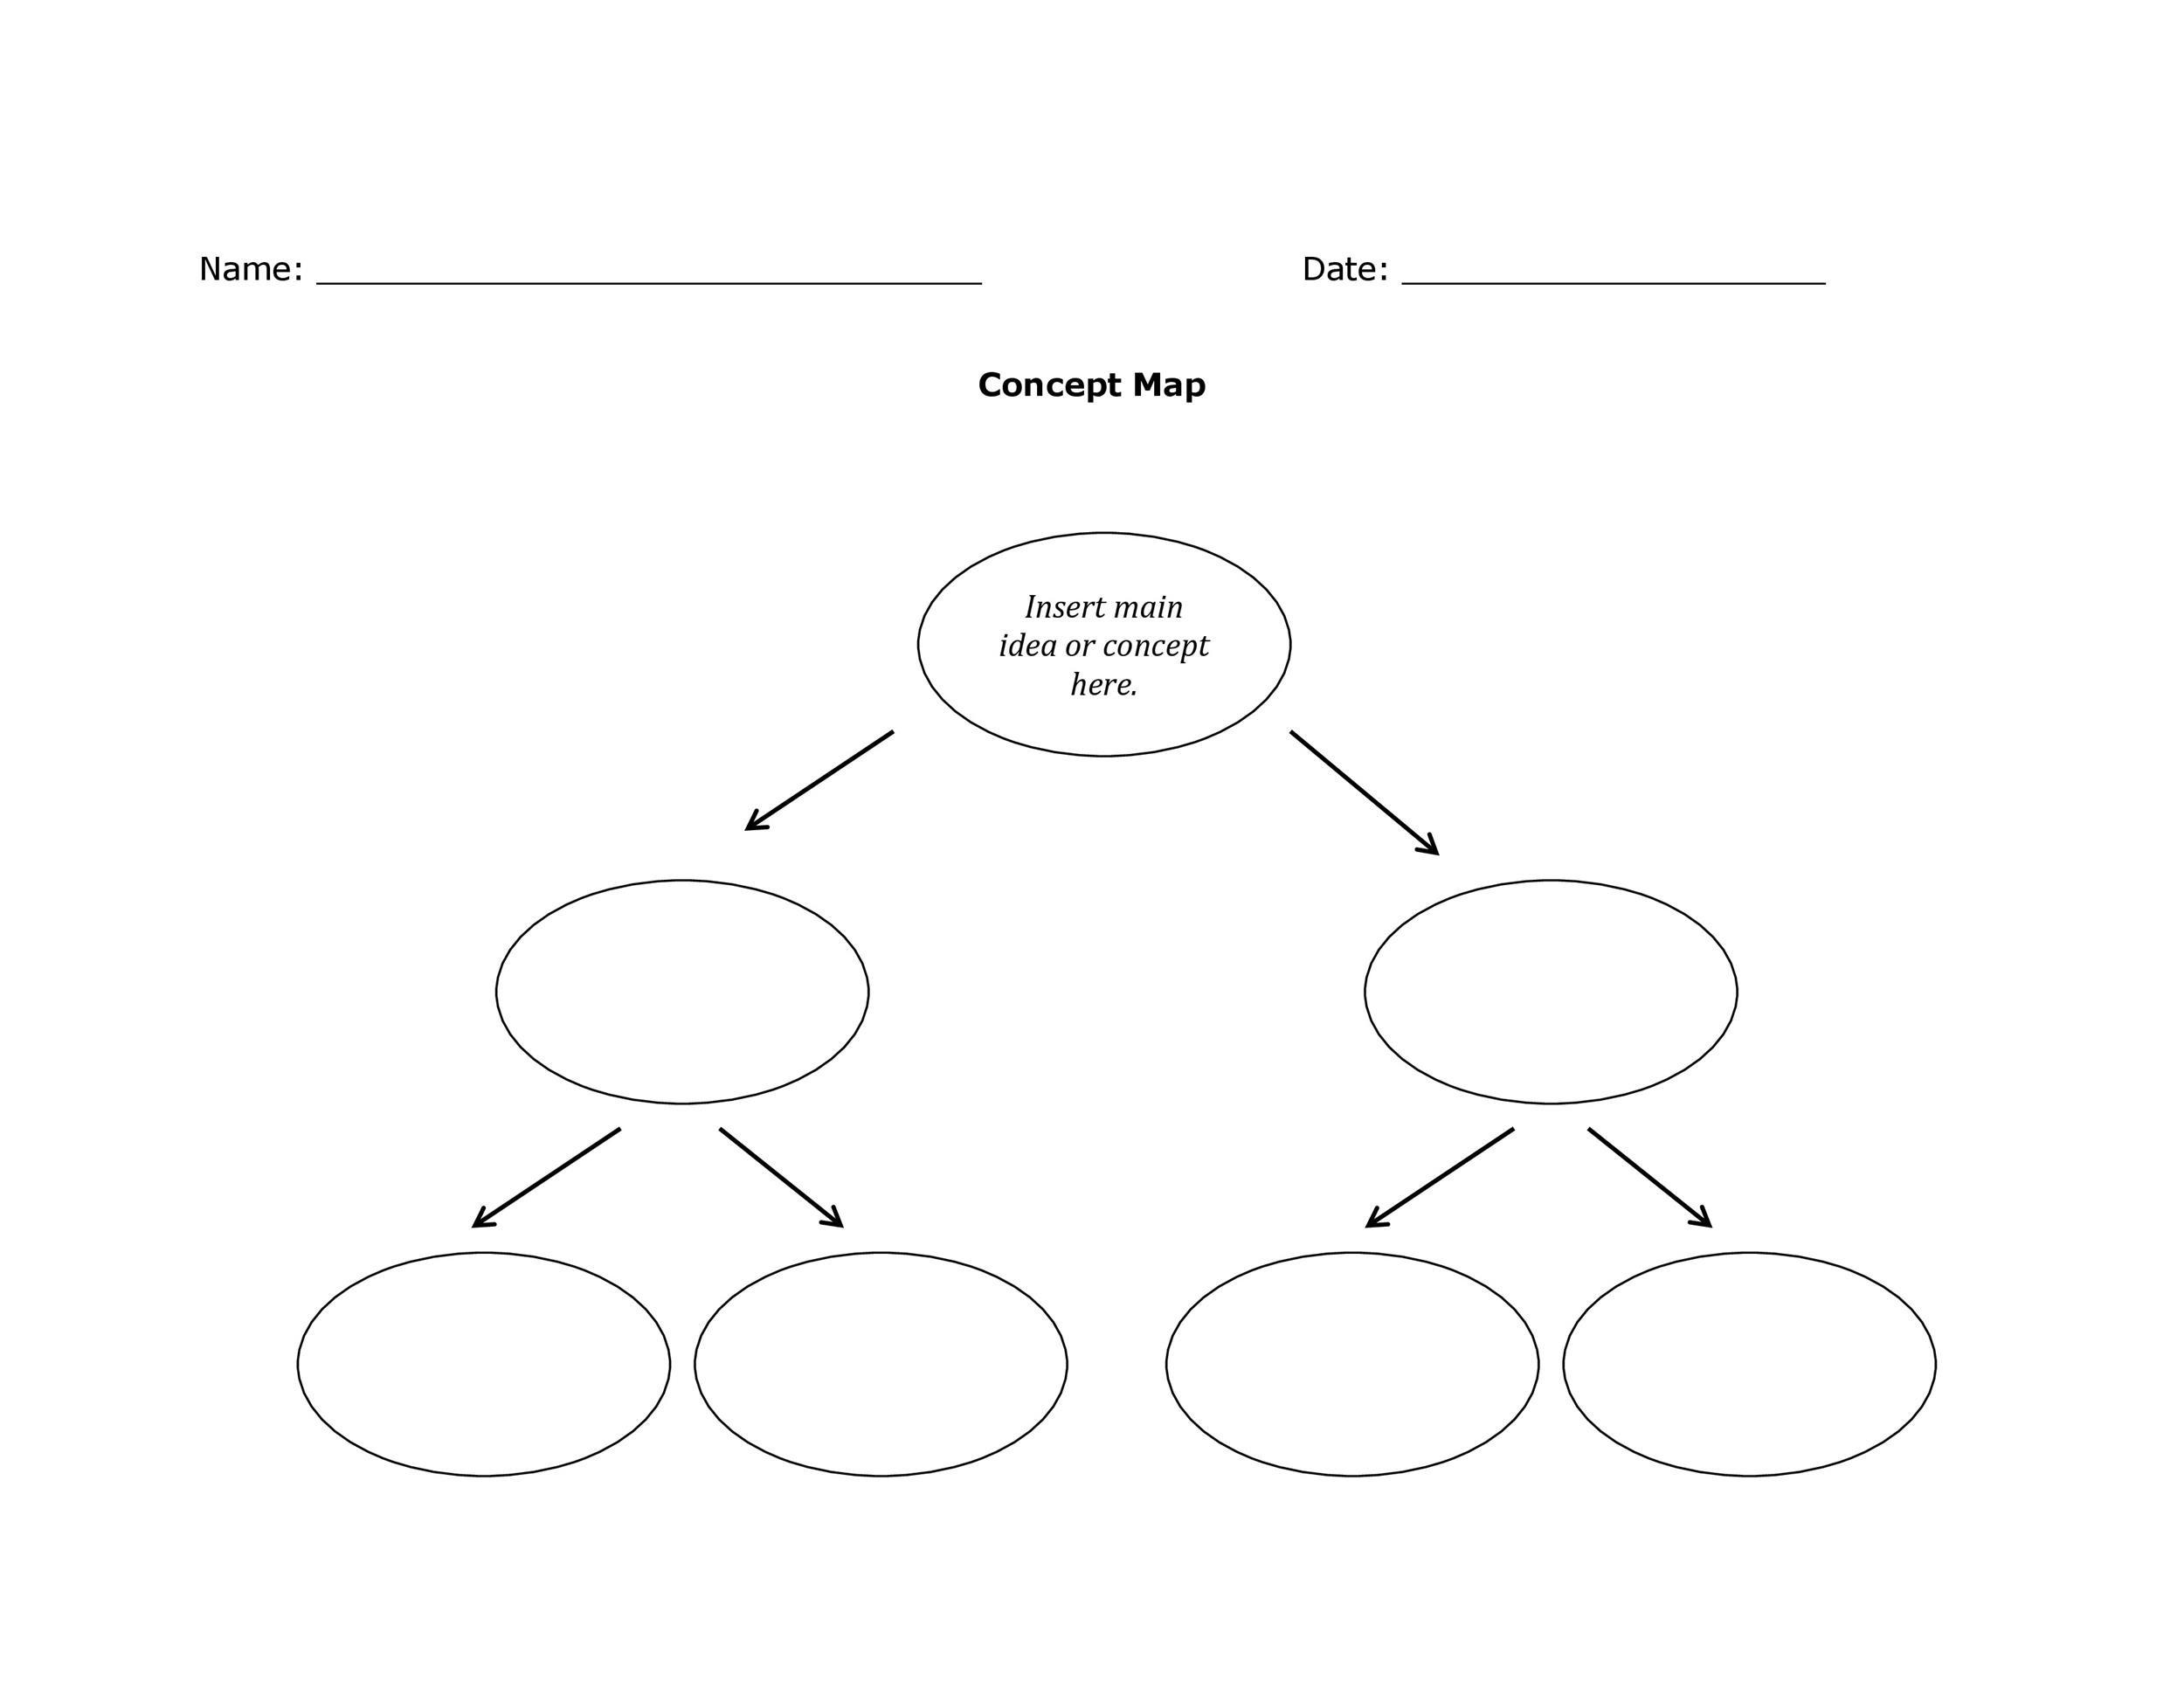 40+ Concept Map Templates Hierarchical, Spider, Flowchart - Flow Map Printable